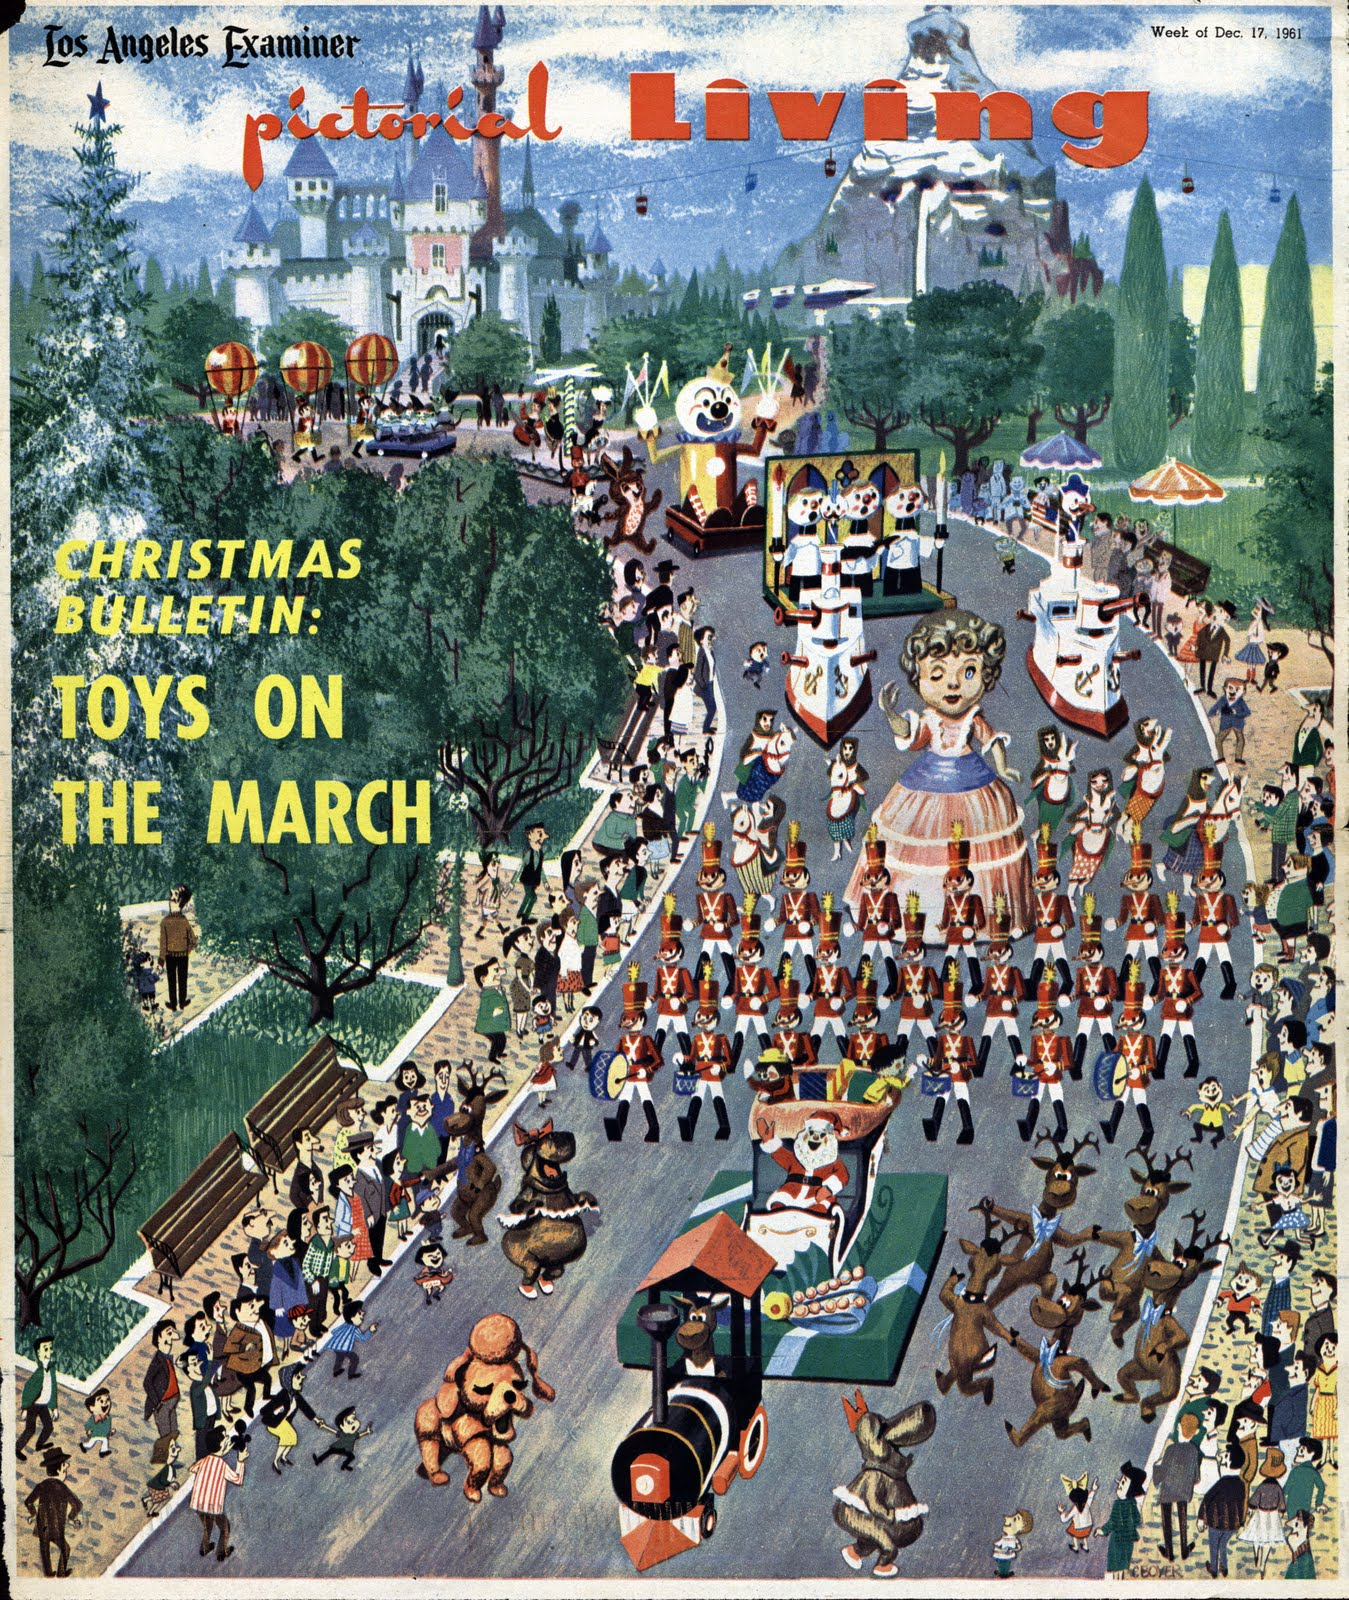 Anciennes Parades des Resorts Américains La_examiner